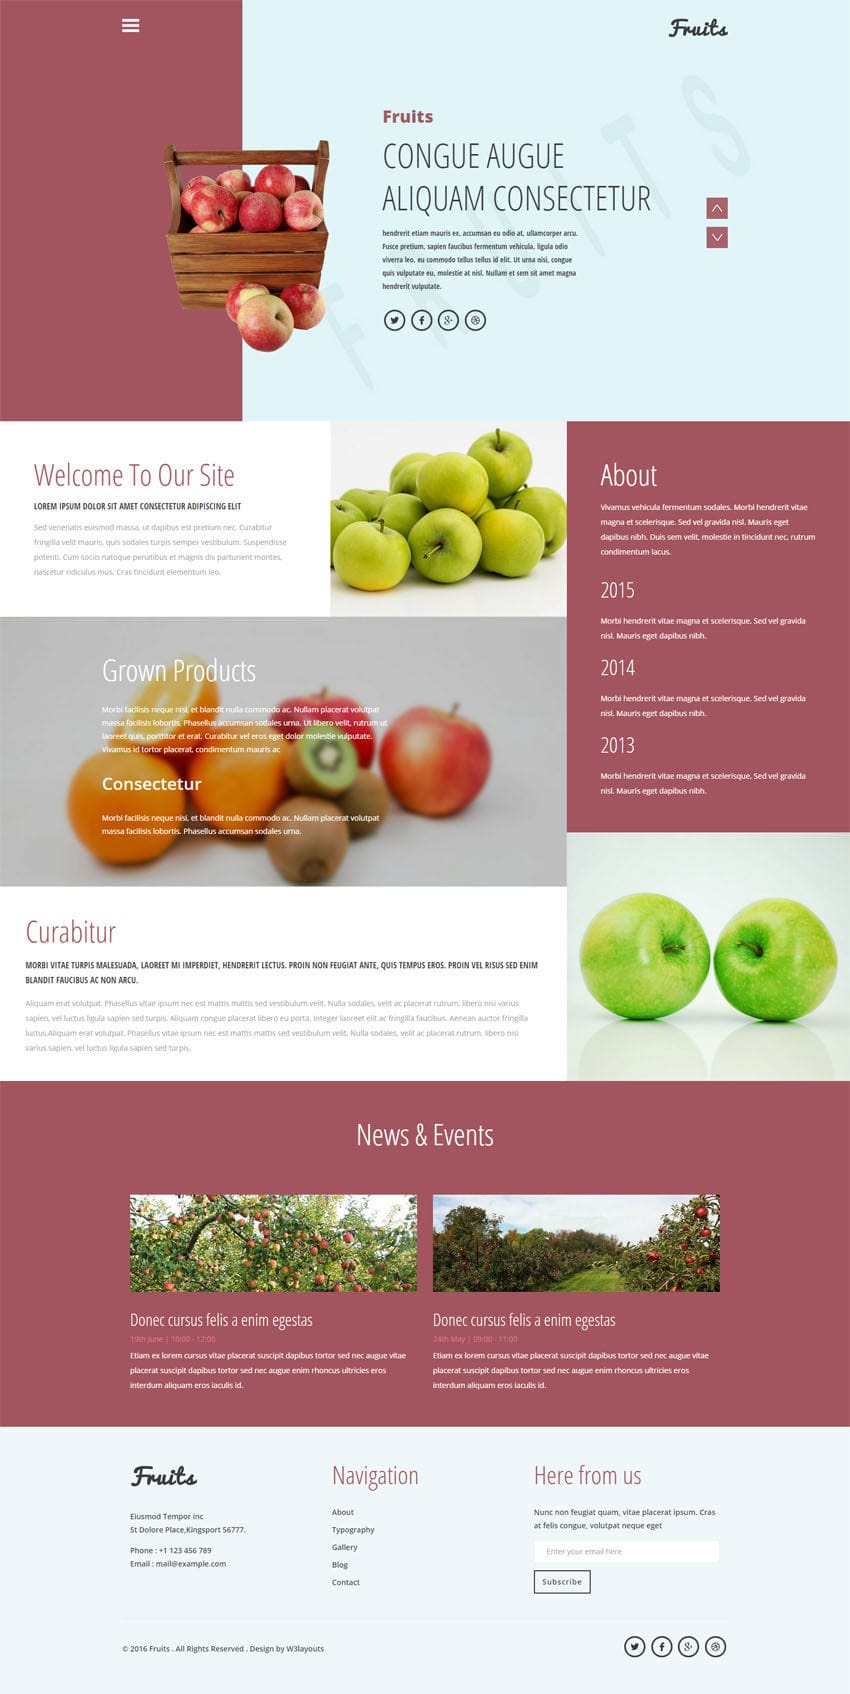 fruits_full